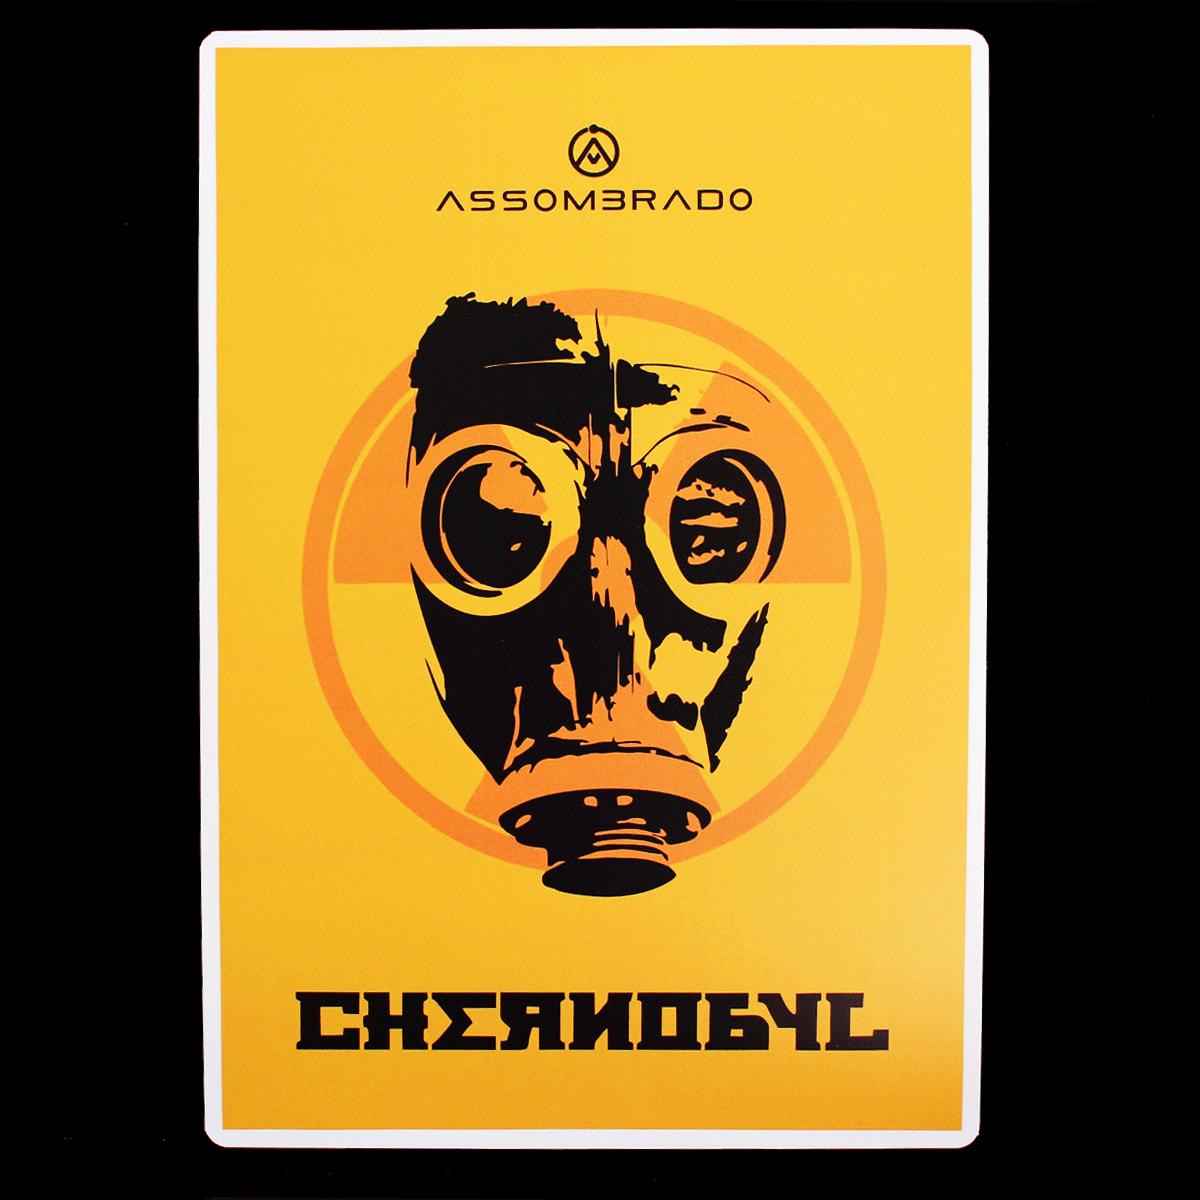 Placa Chernobyl